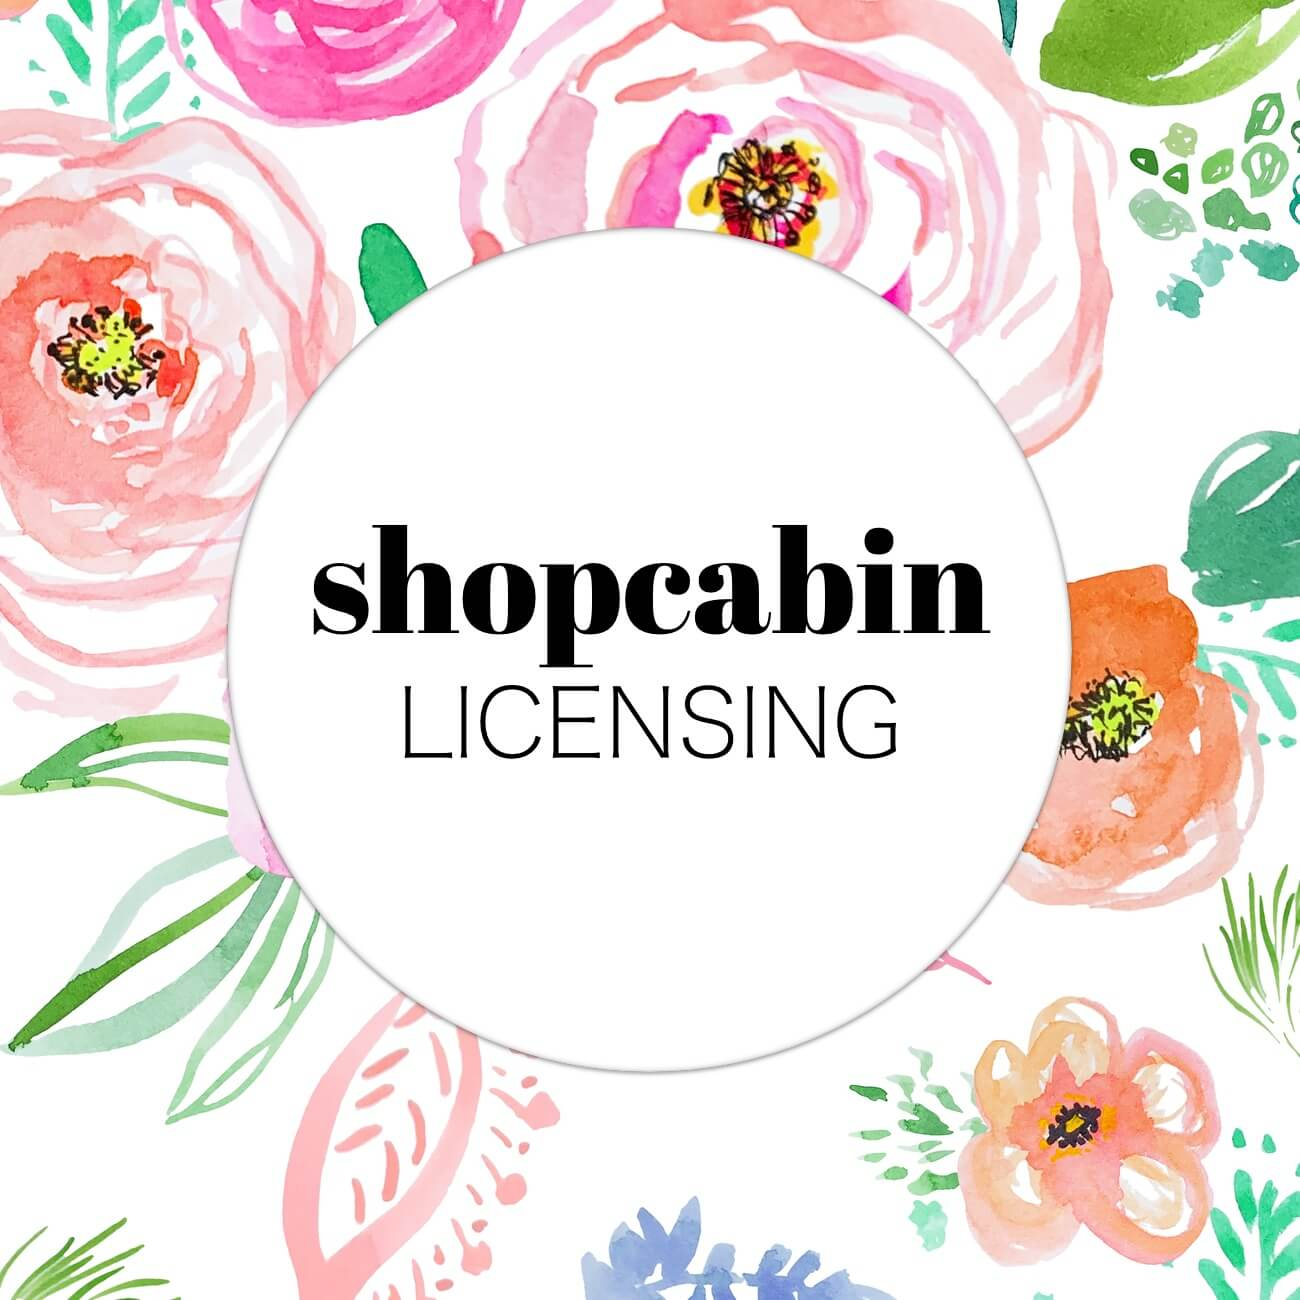 shopcabin licensing 2.jpg